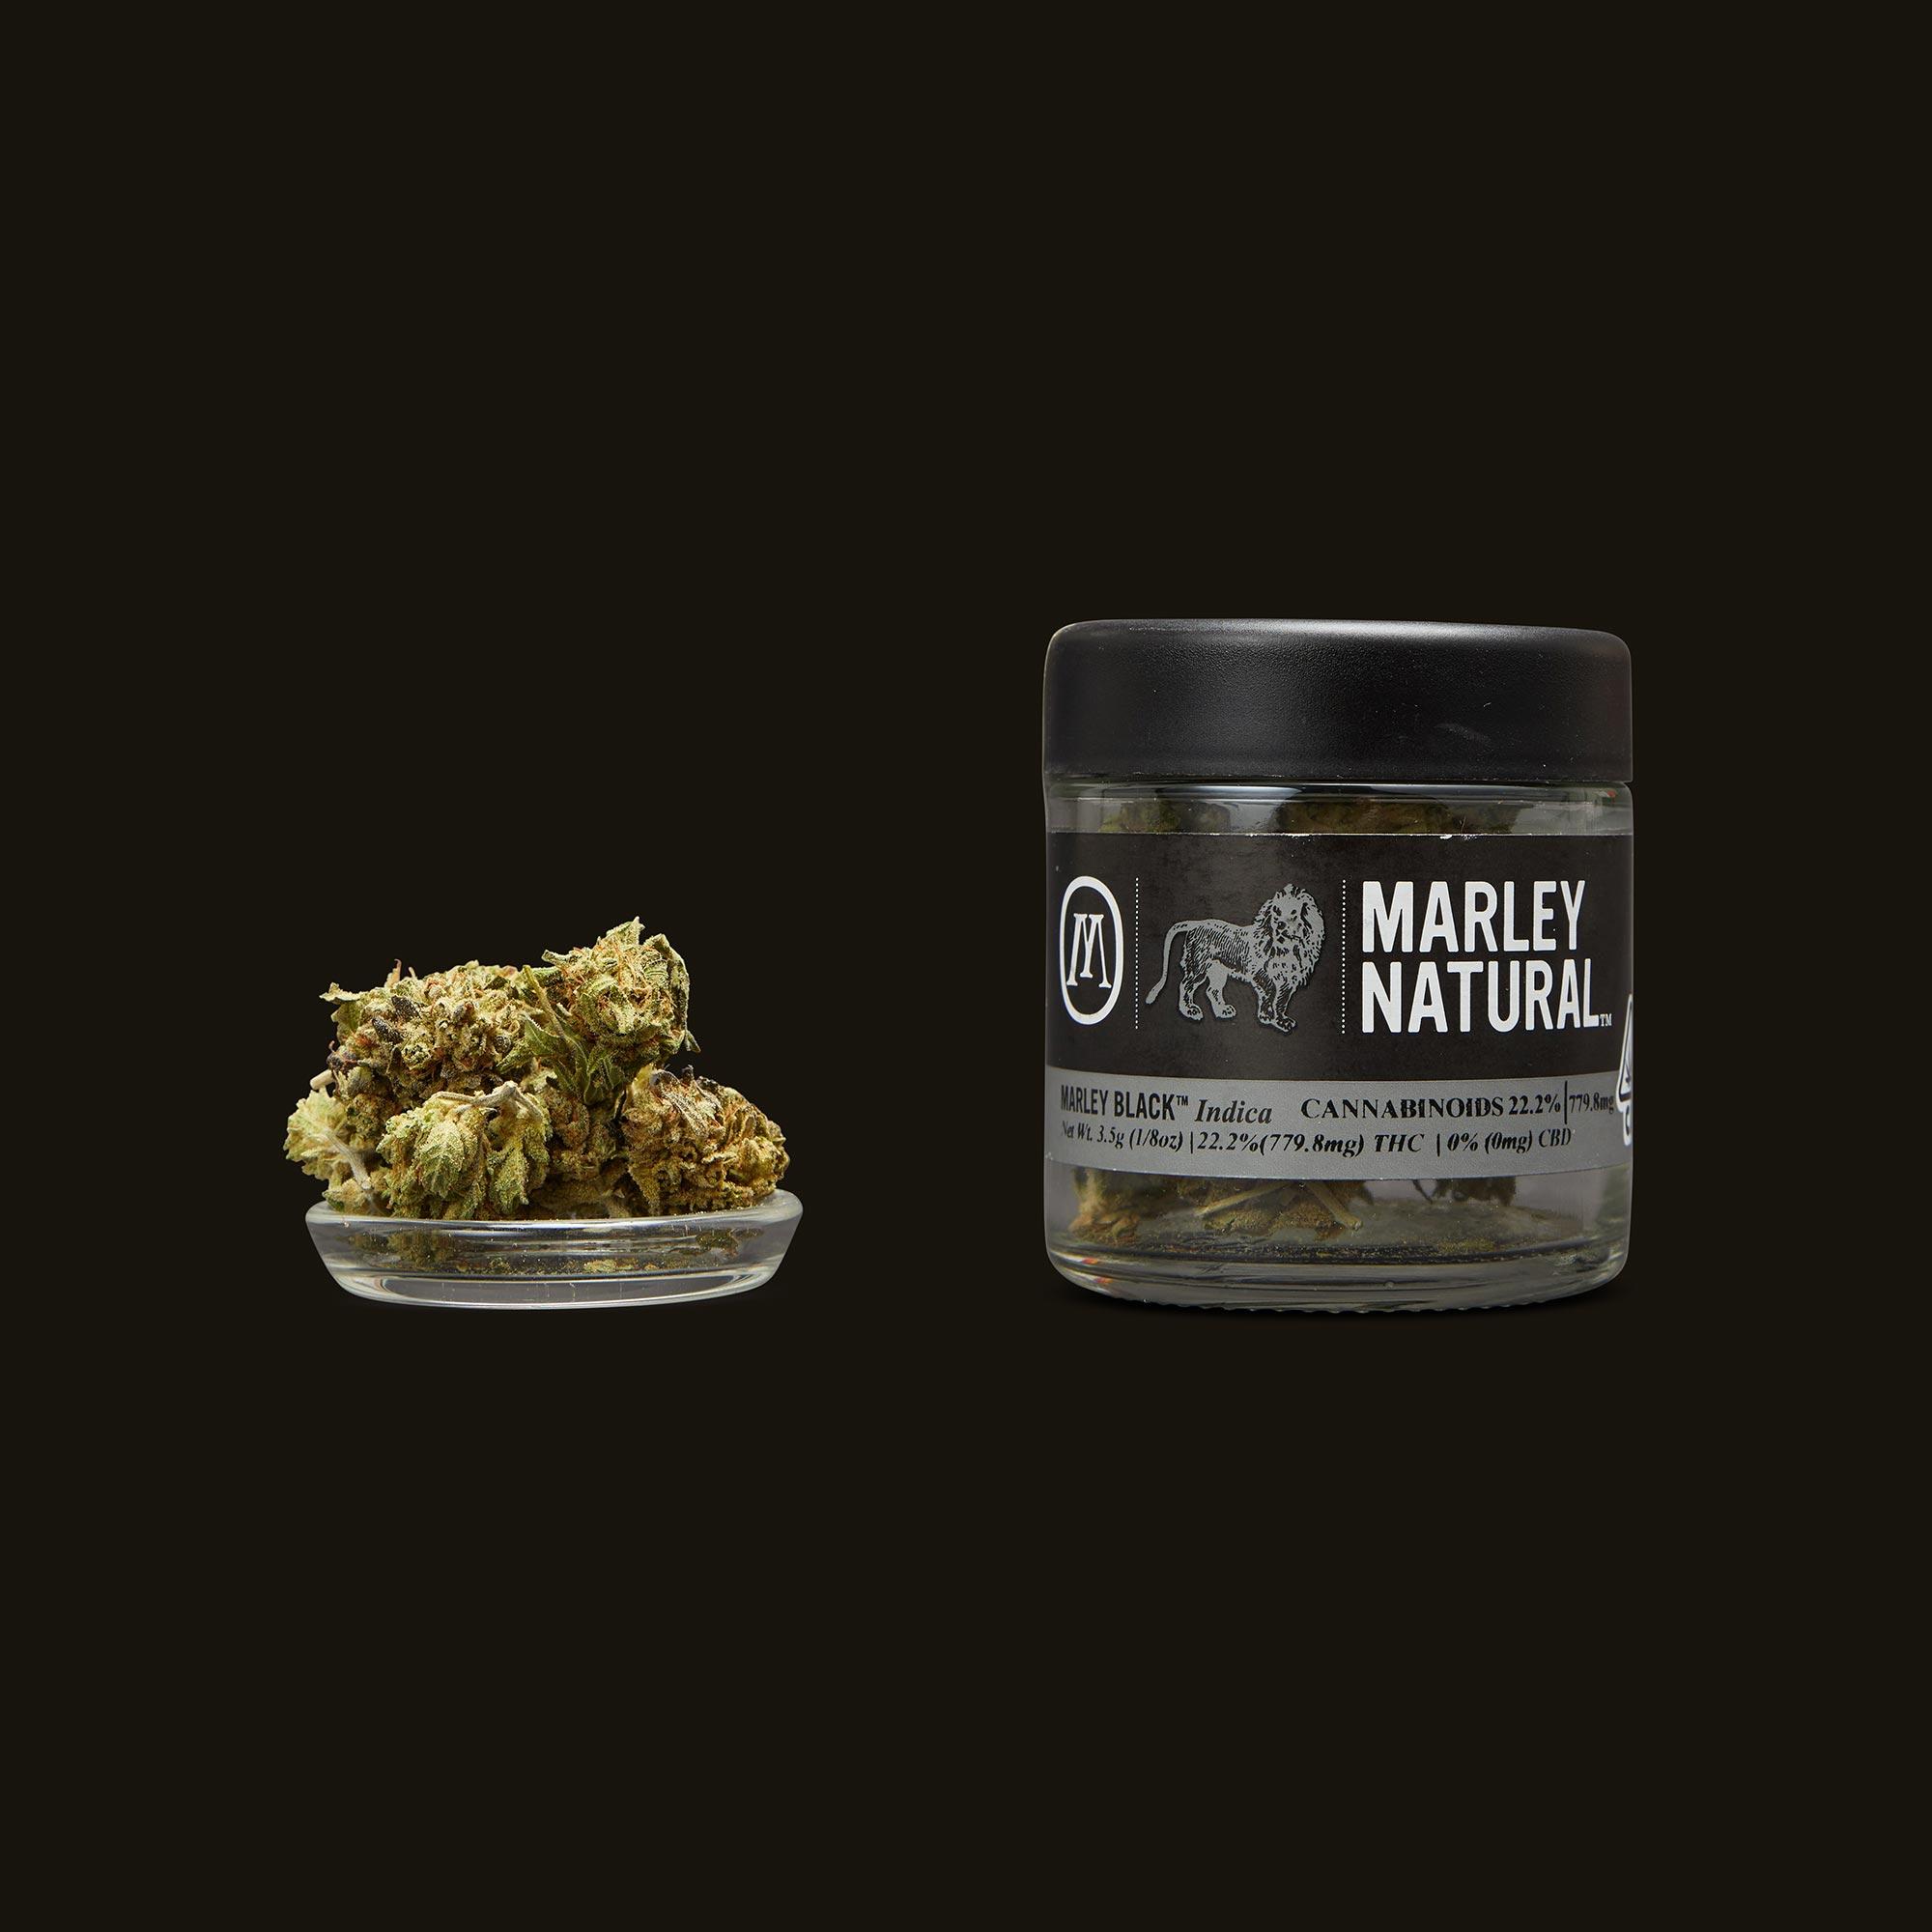 Marley Natural Cookie Dawg